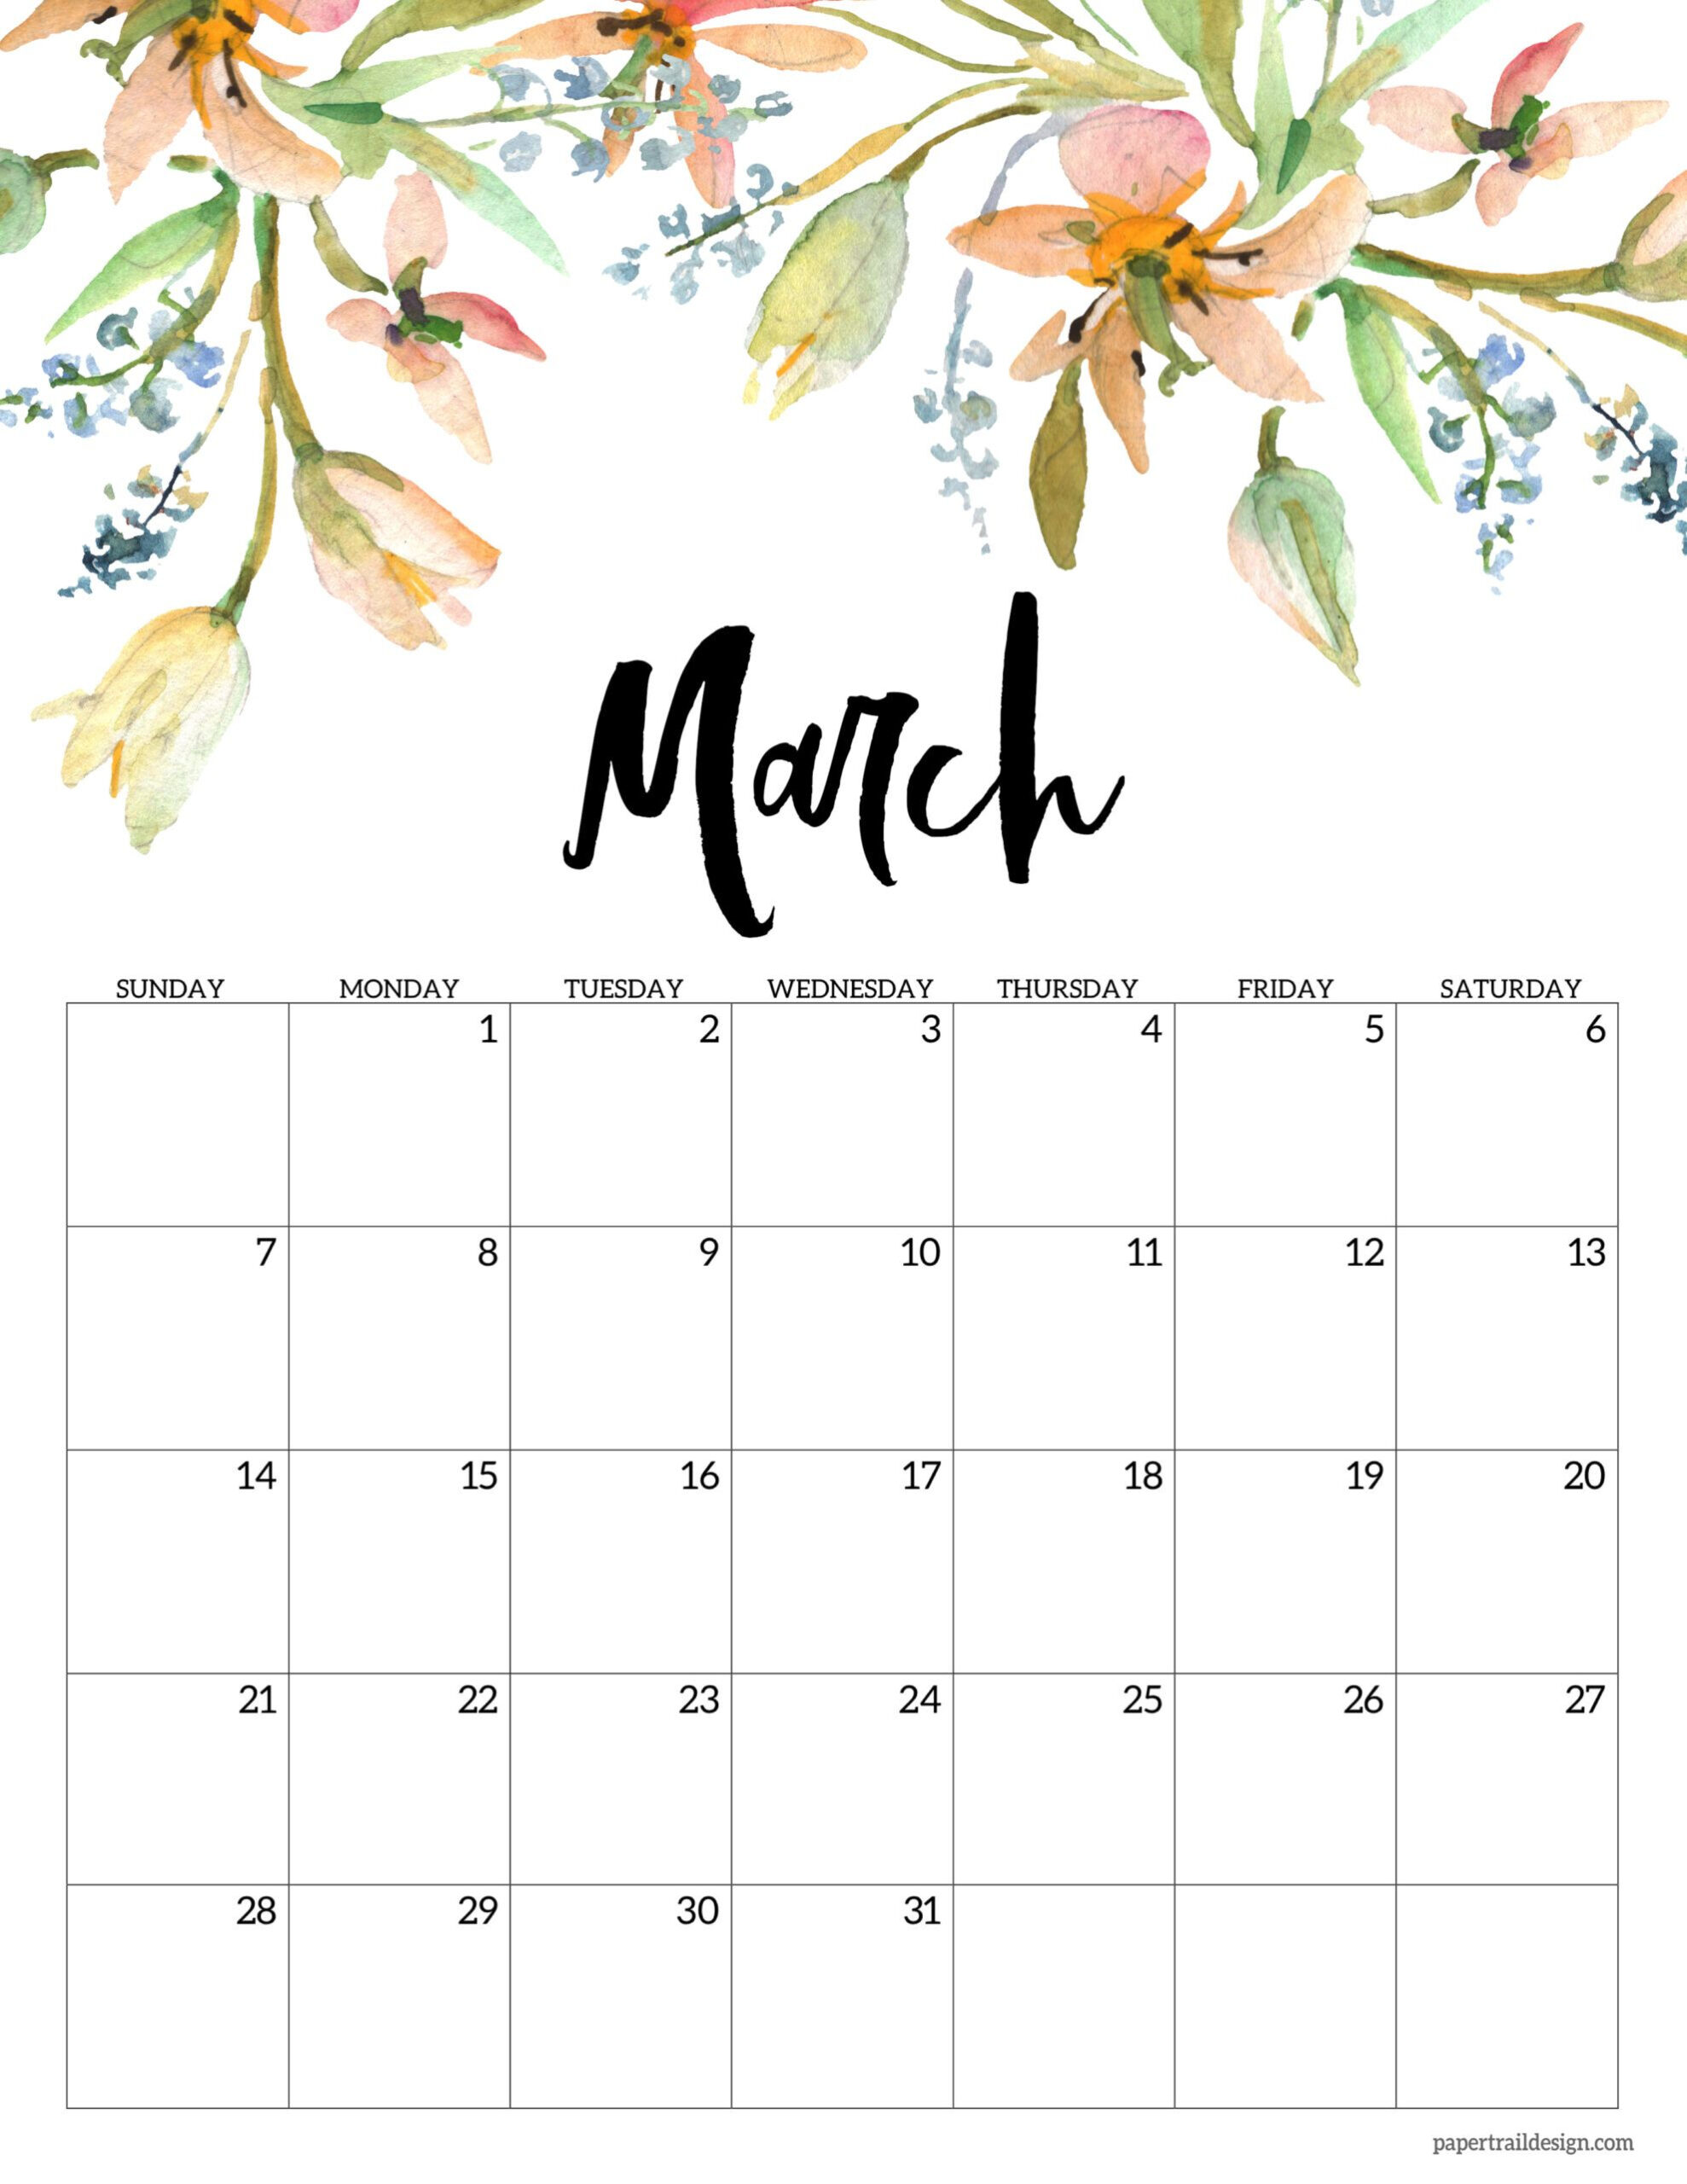 Cute March 2021 Floral Calendar In 2020 | Monthly Calendar